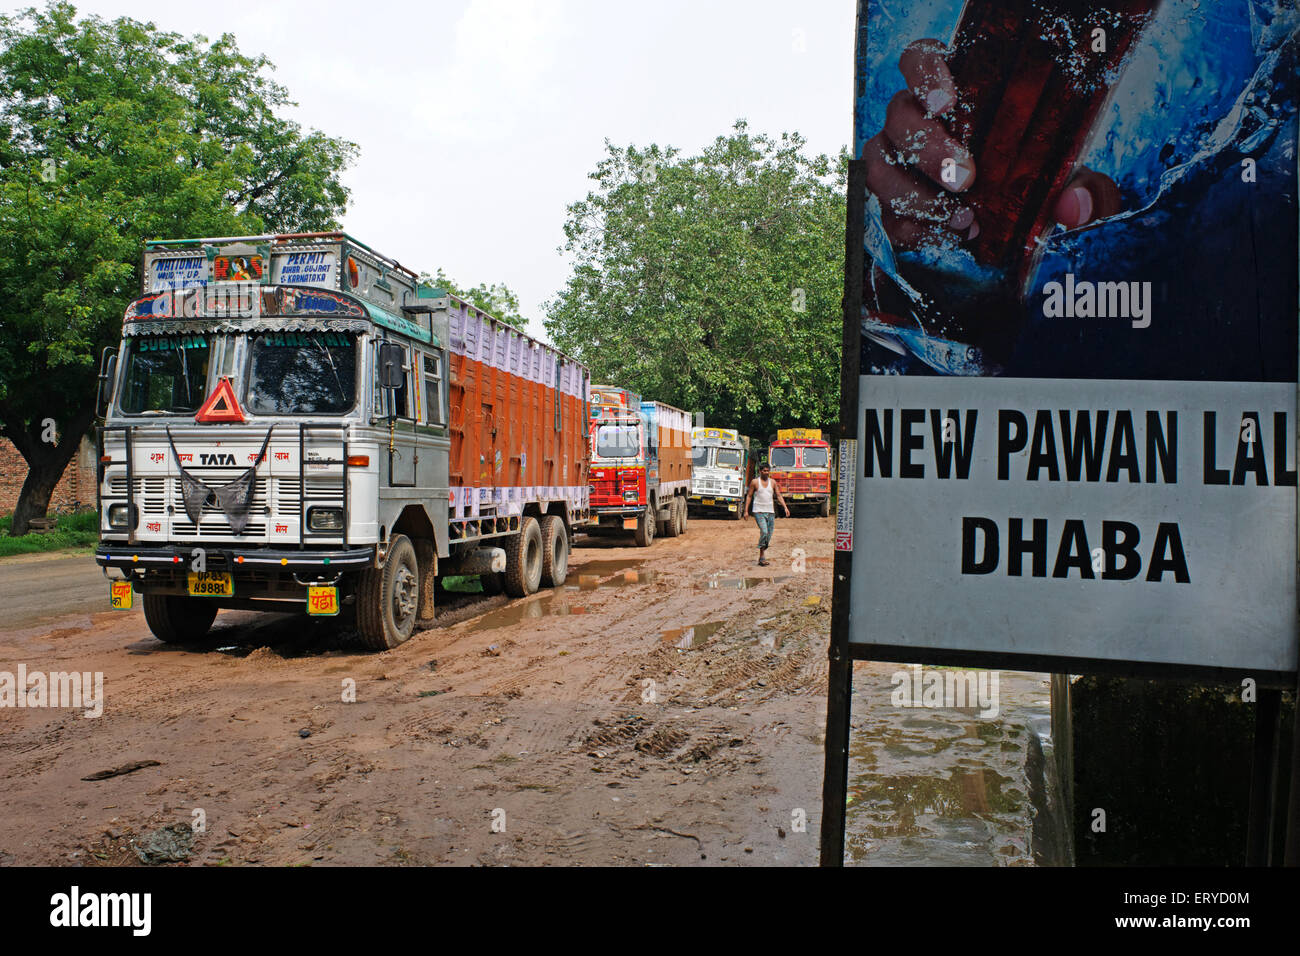 Truck stand near new pawn lal dhaba ; Uttar Pradesh ; India - Stock Image